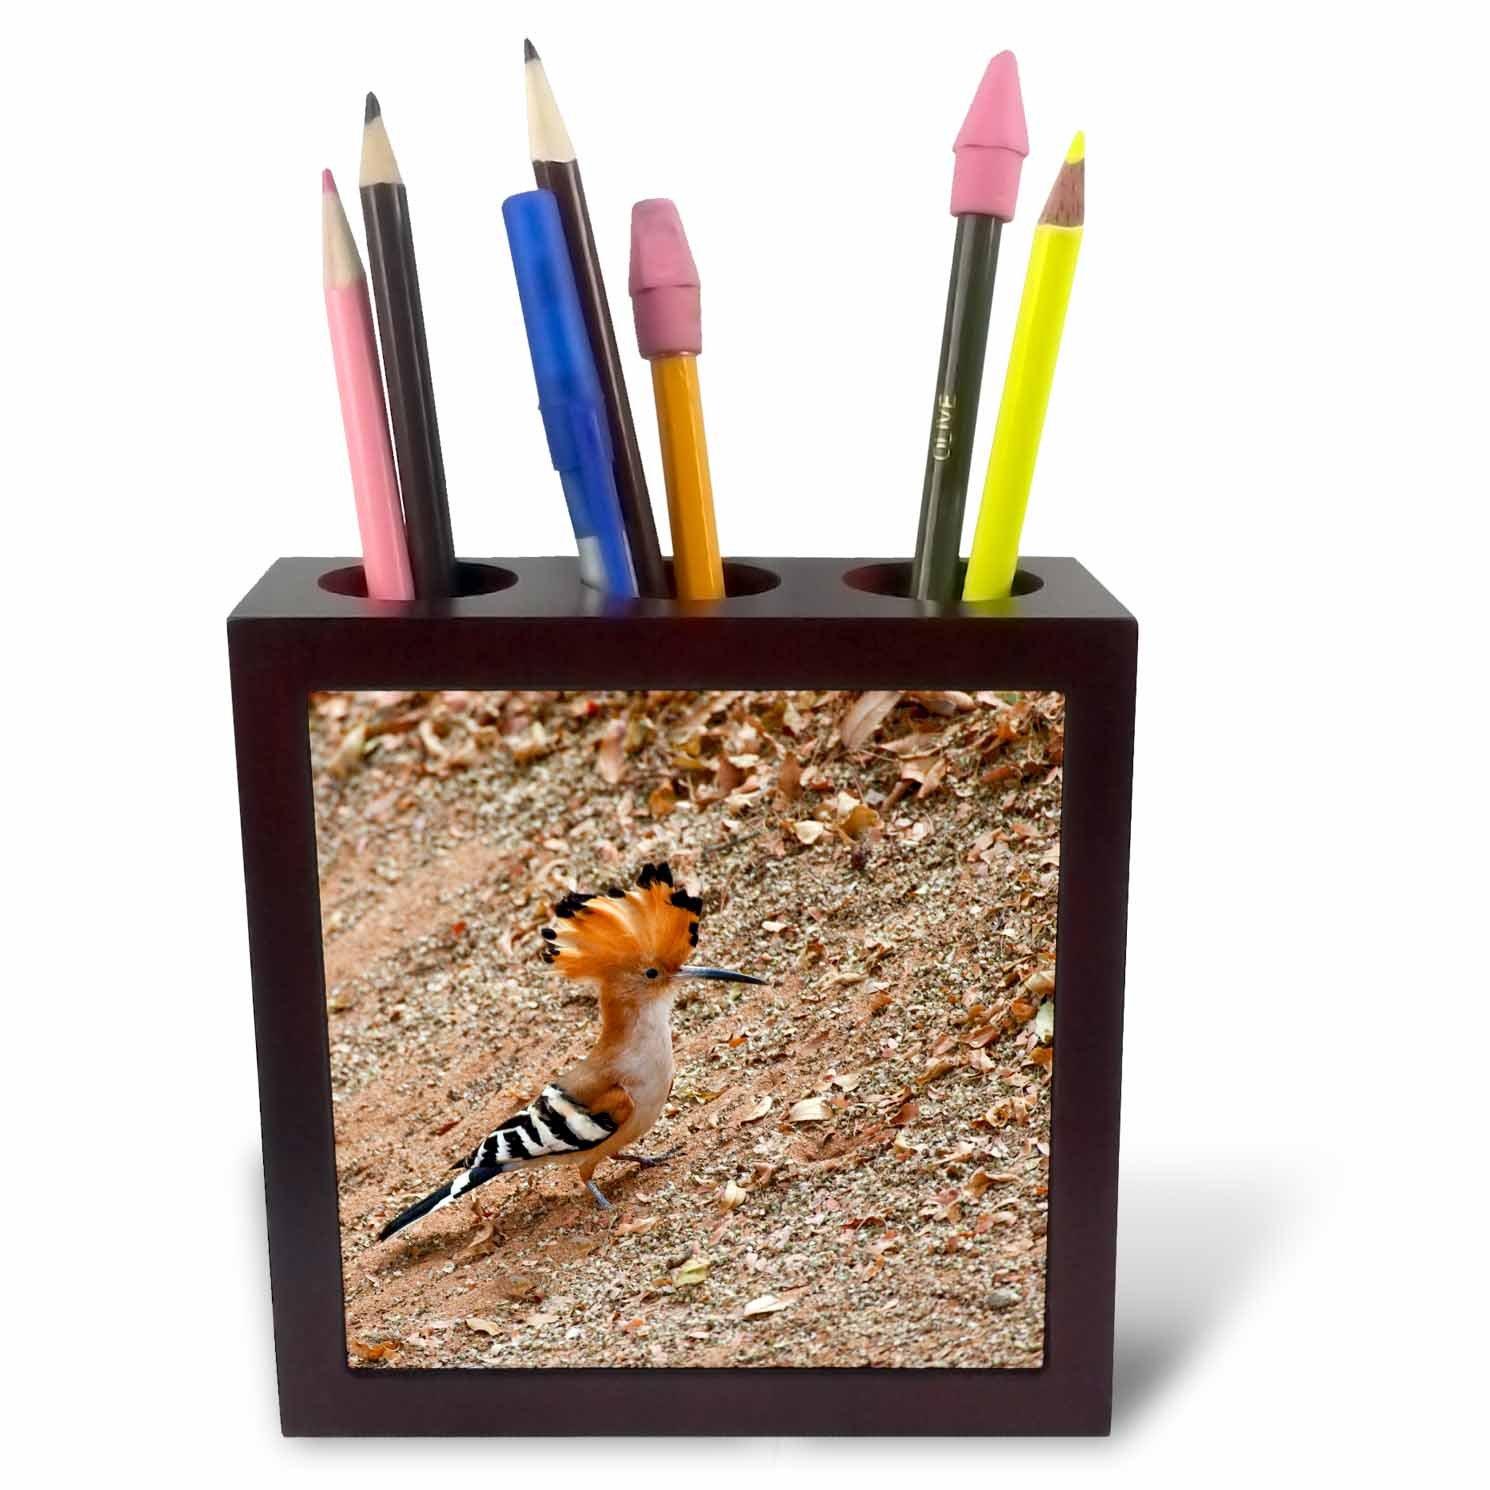 Endemic Bird-AF24 CSL0021-Charles Sleicher-Tile Pen Holder 3dRose ph/_70414/_1 Madagascar Madagascar Hoopoe 5-Inch